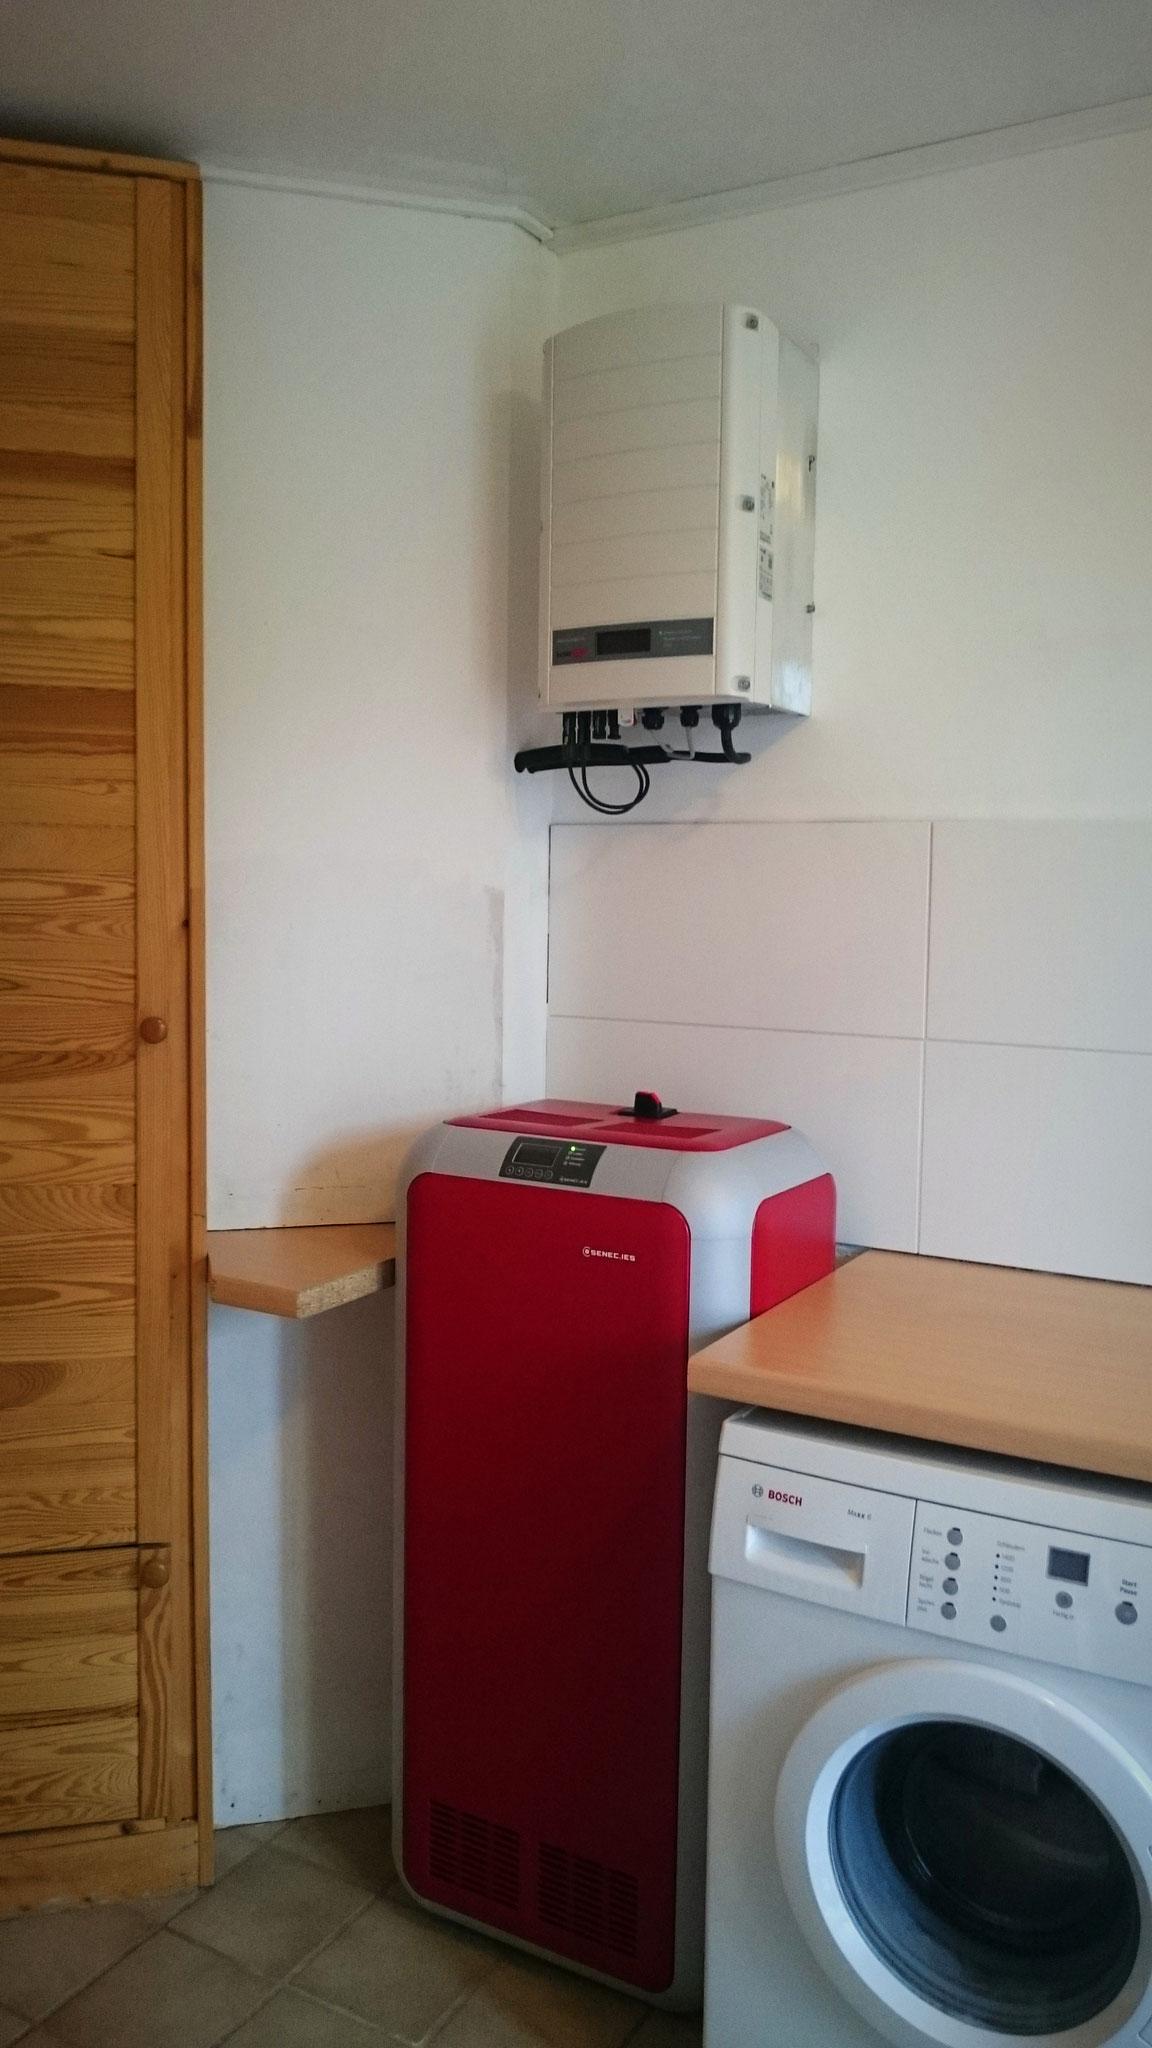 10 kWh Li Senec Speicher inkl. SENEC.CLOUD 2.0 in Stralsund